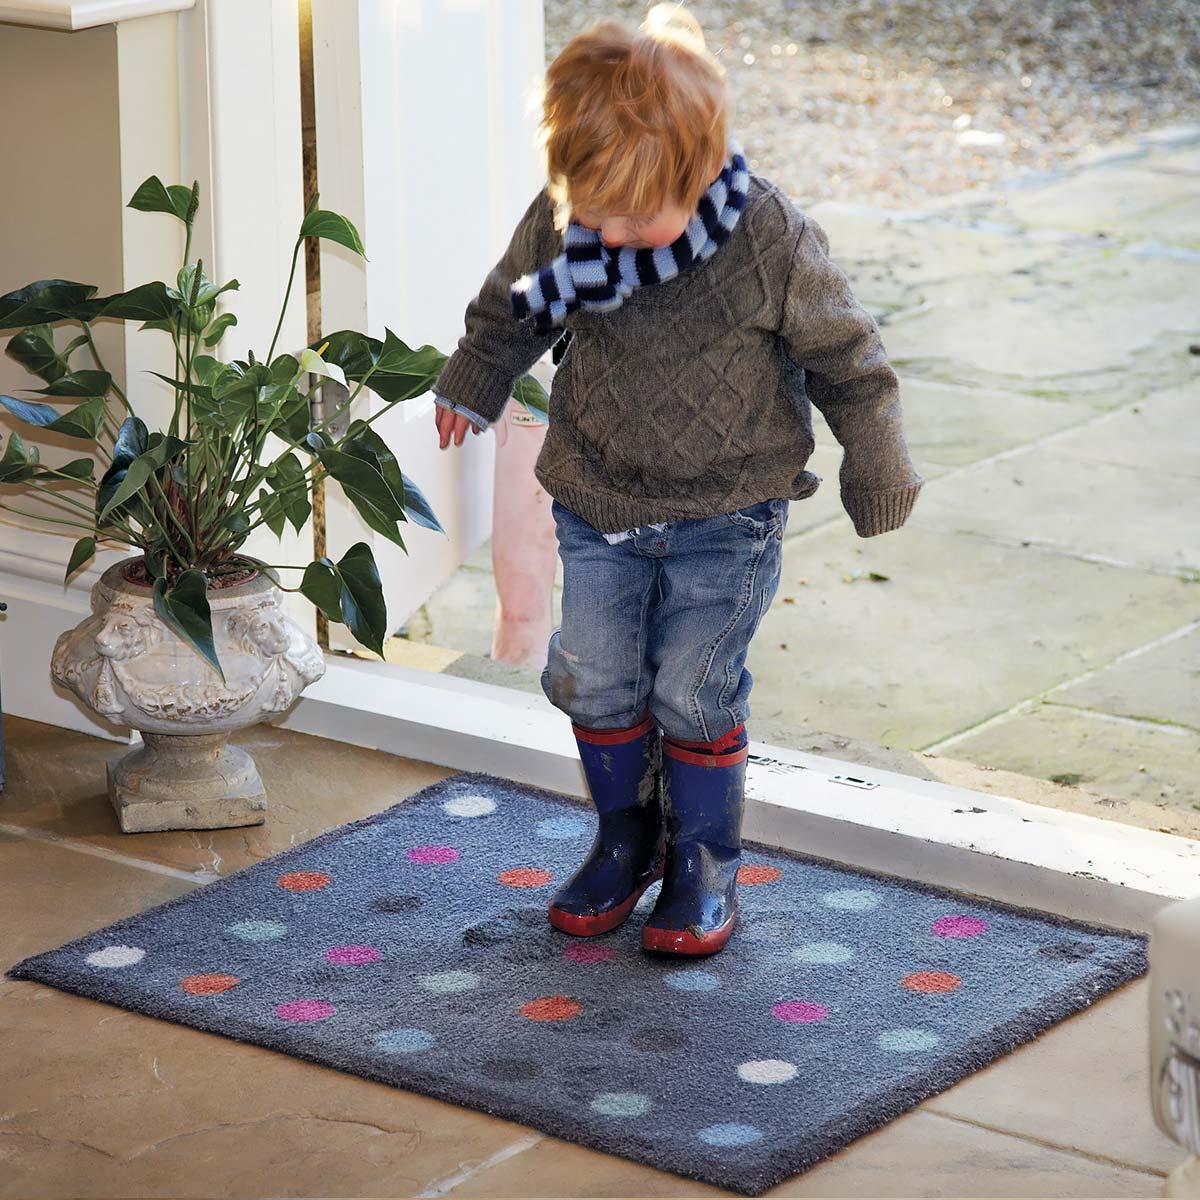 paillasson motifs ultra absorbant 100 recycl paillasson nettoie bottes. Black Bedroom Furniture Sets. Home Design Ideas